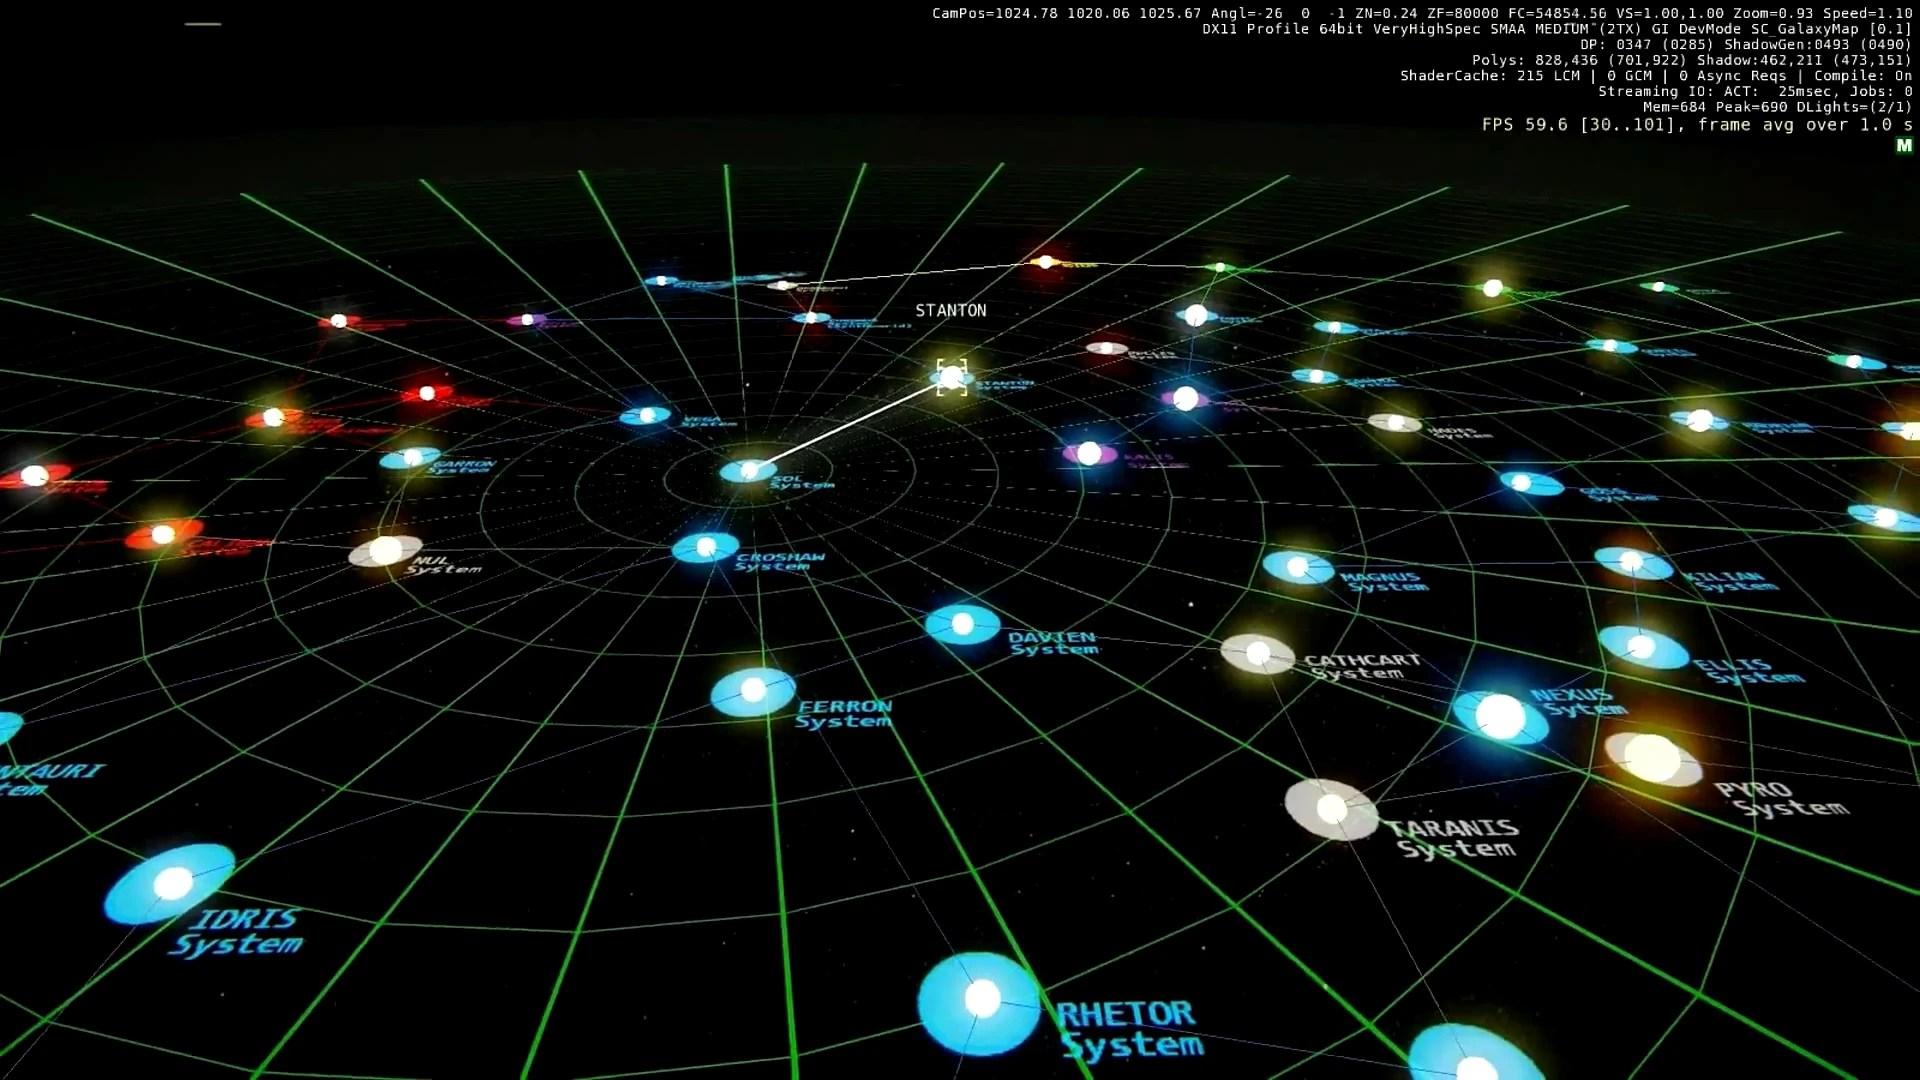 3d Galactic Wallpaper Star Map Star Citizen Wiki Fandom Powered By Wikia